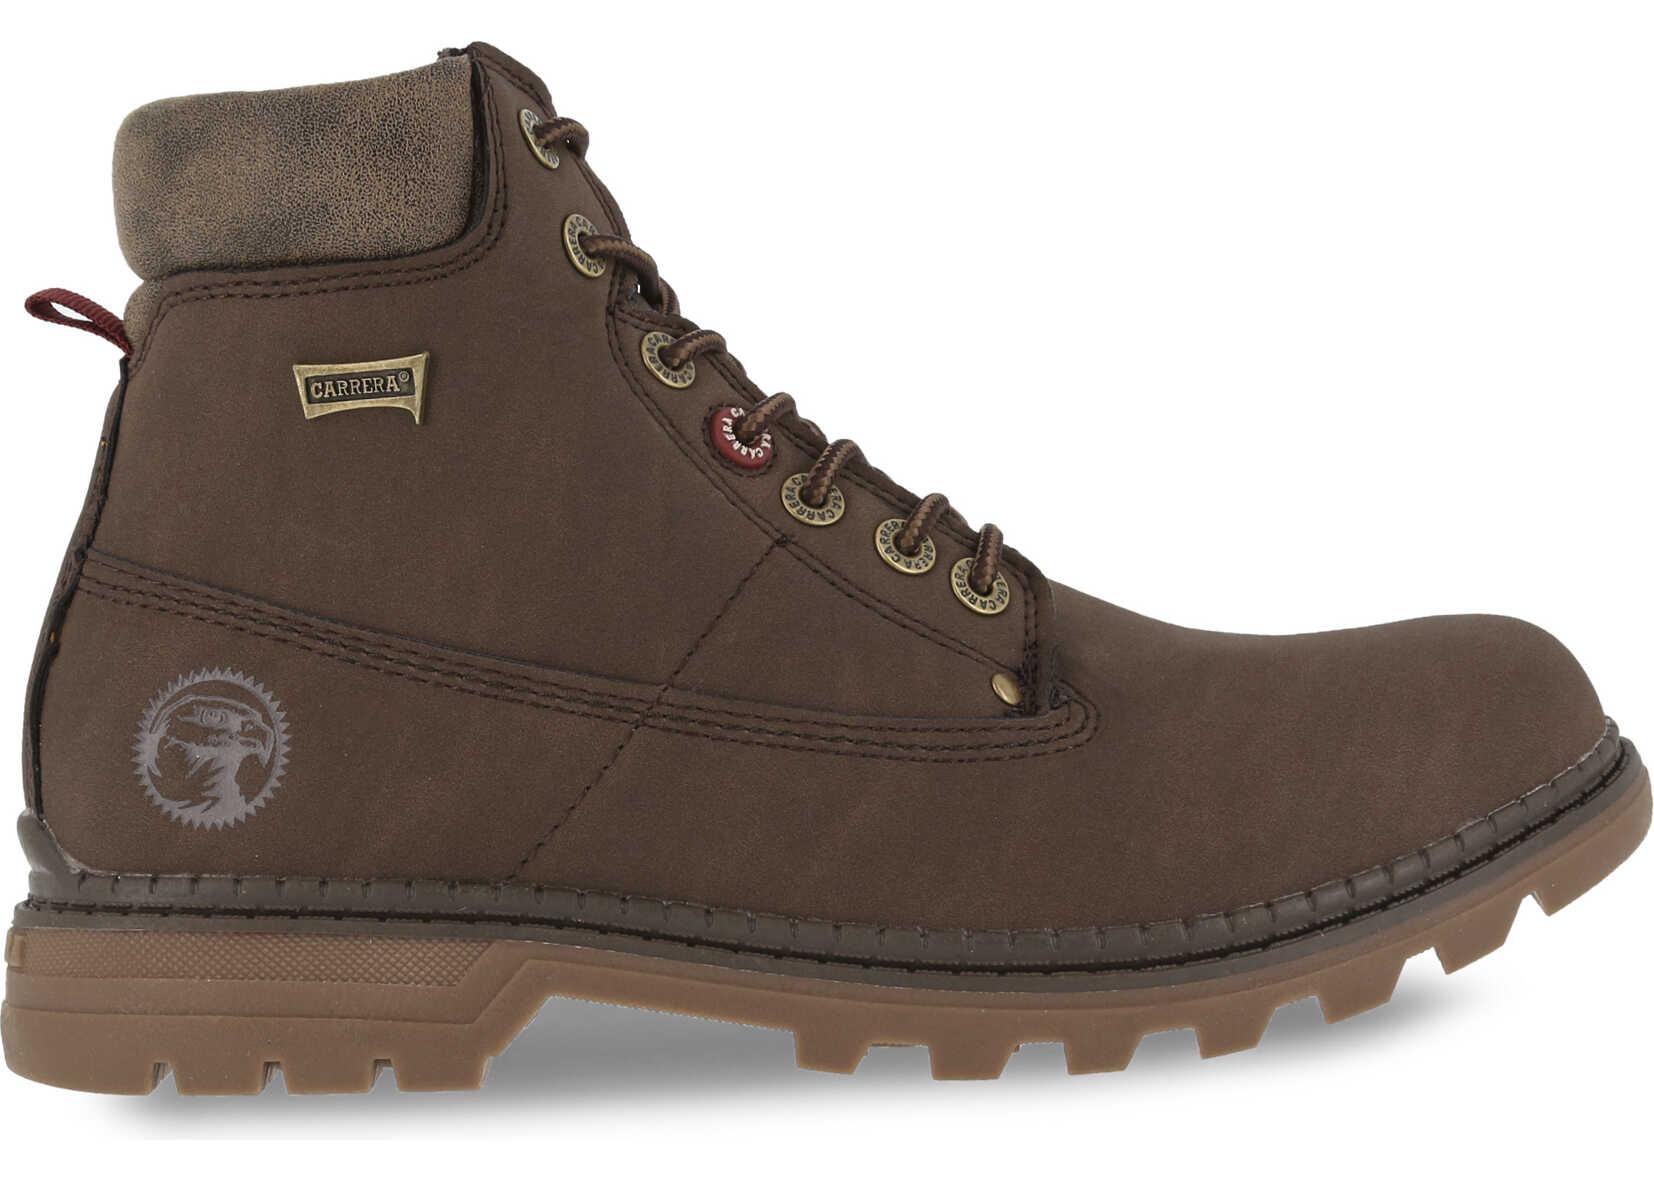 Carrera Jeans Nevada_Cam721050 Brown